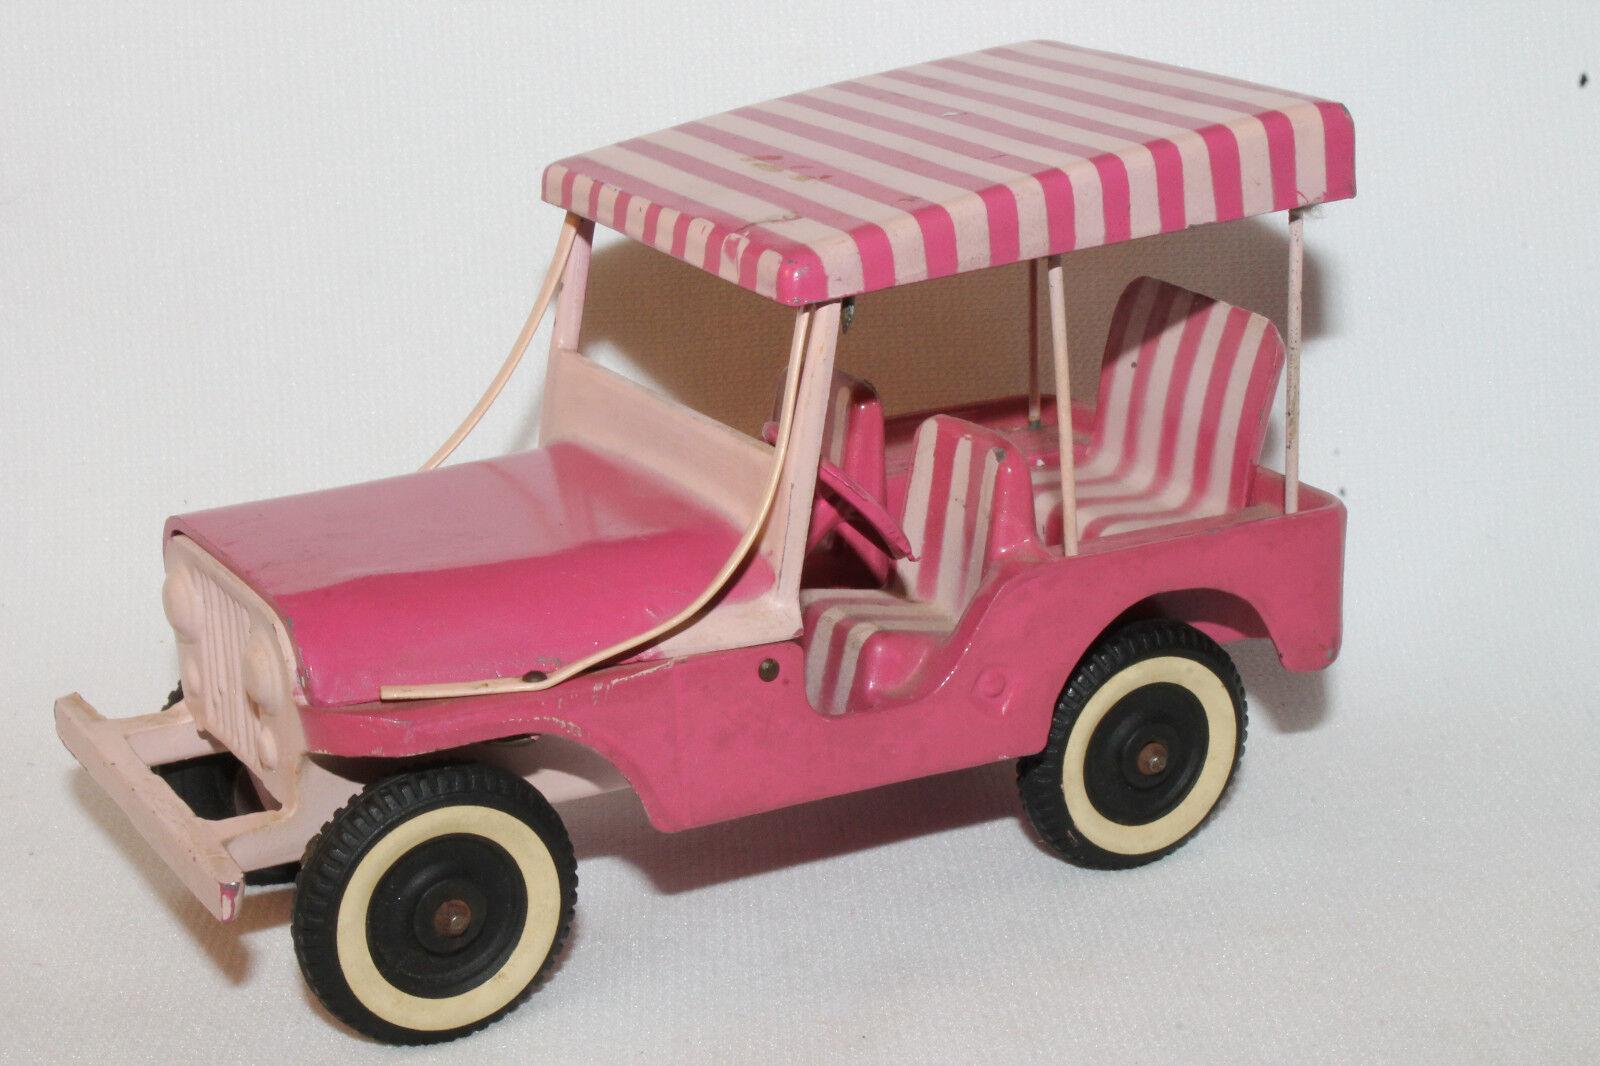 Accucast 1959 Willys Gala Jeep Promo, Surrey Top, Tarro Metal Original